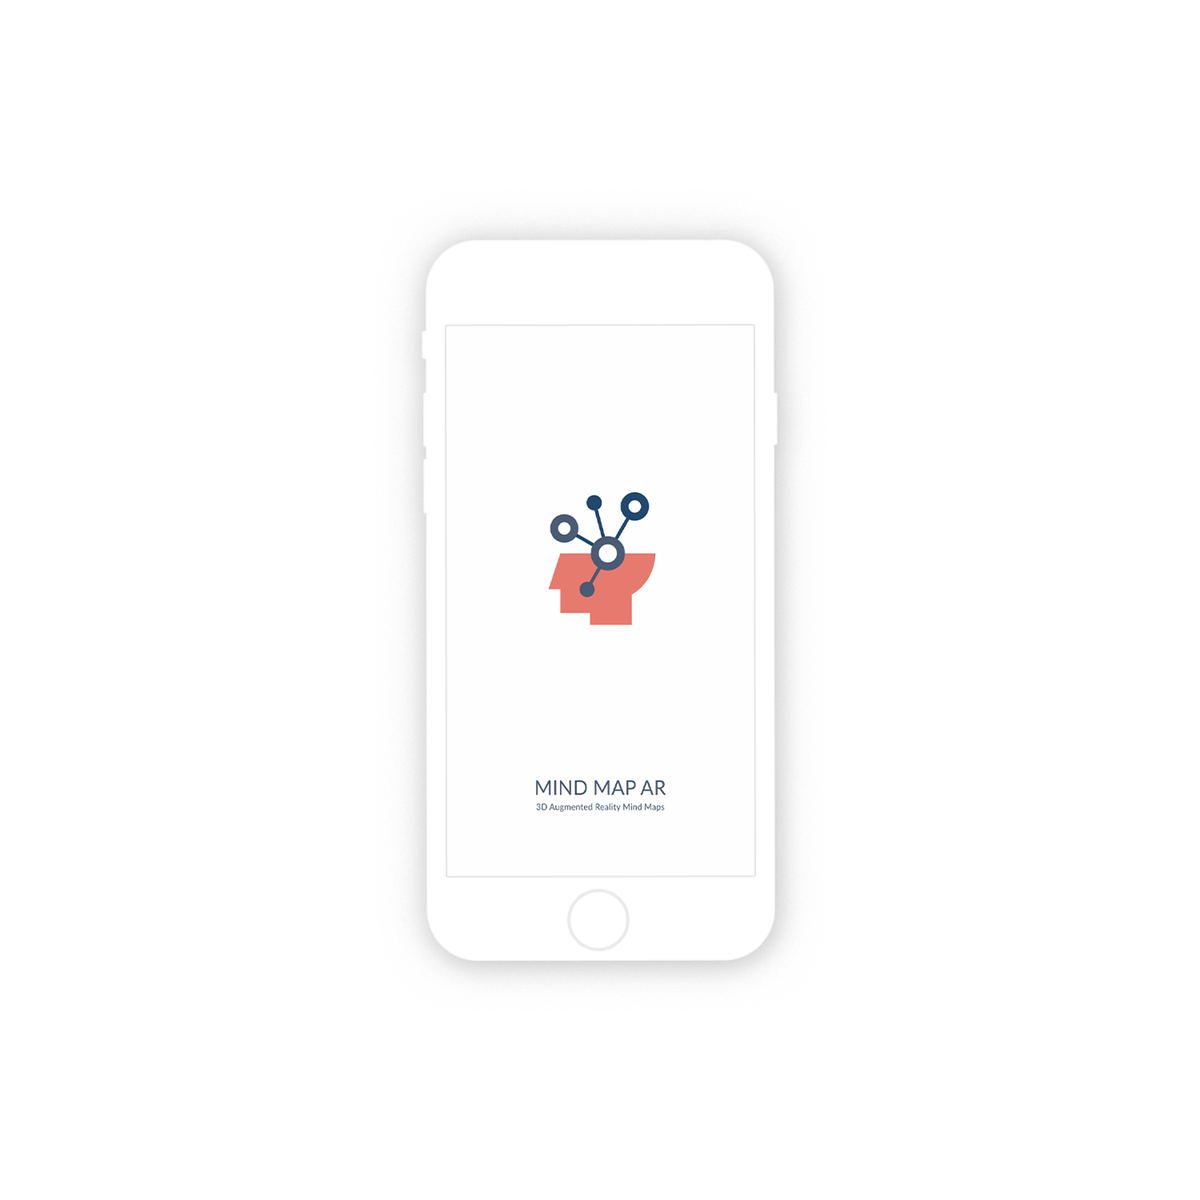 Apply splash screen on phone background image